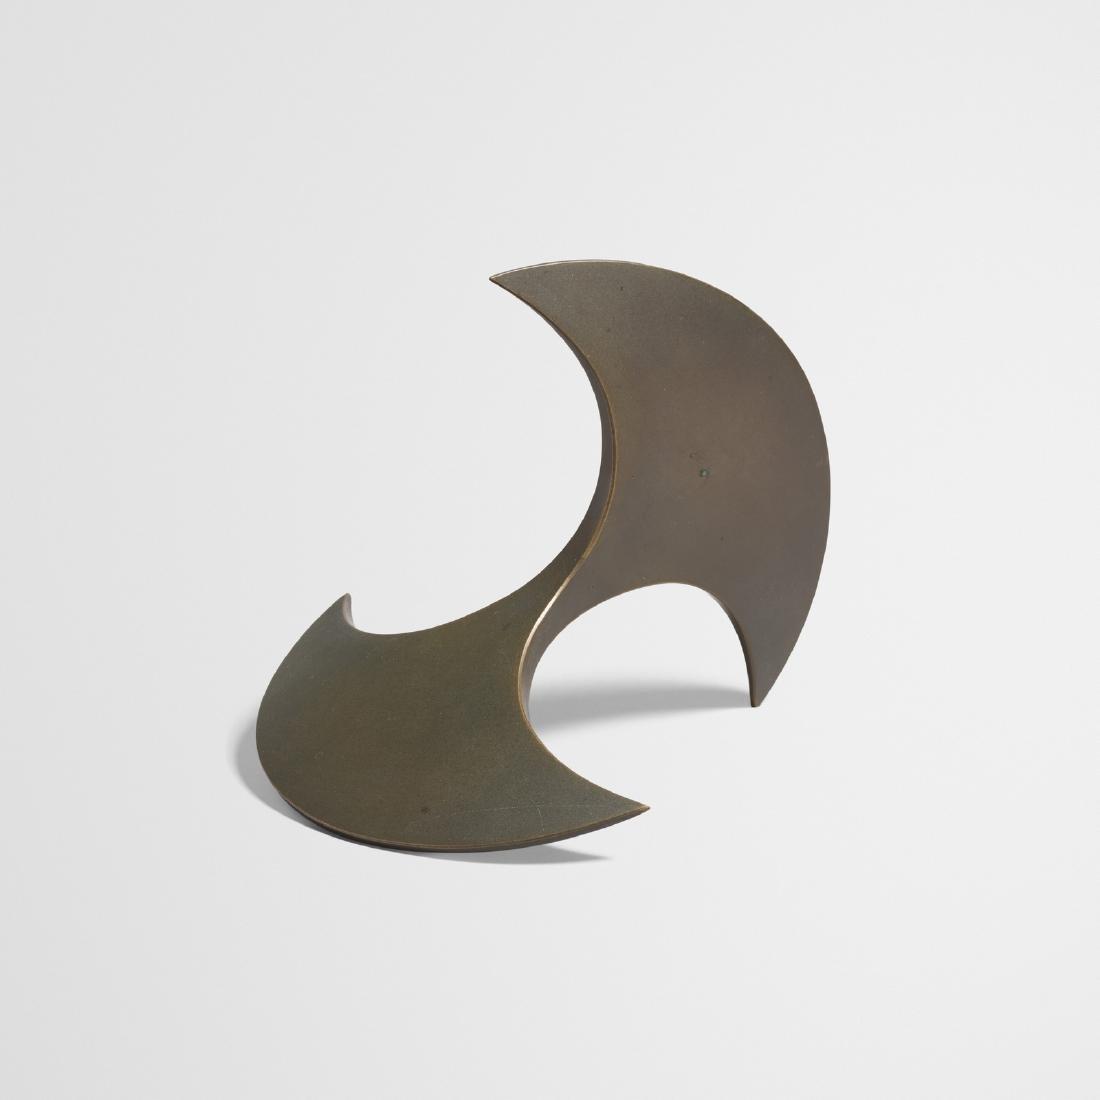 John Prip, Untitled (Axe Form)